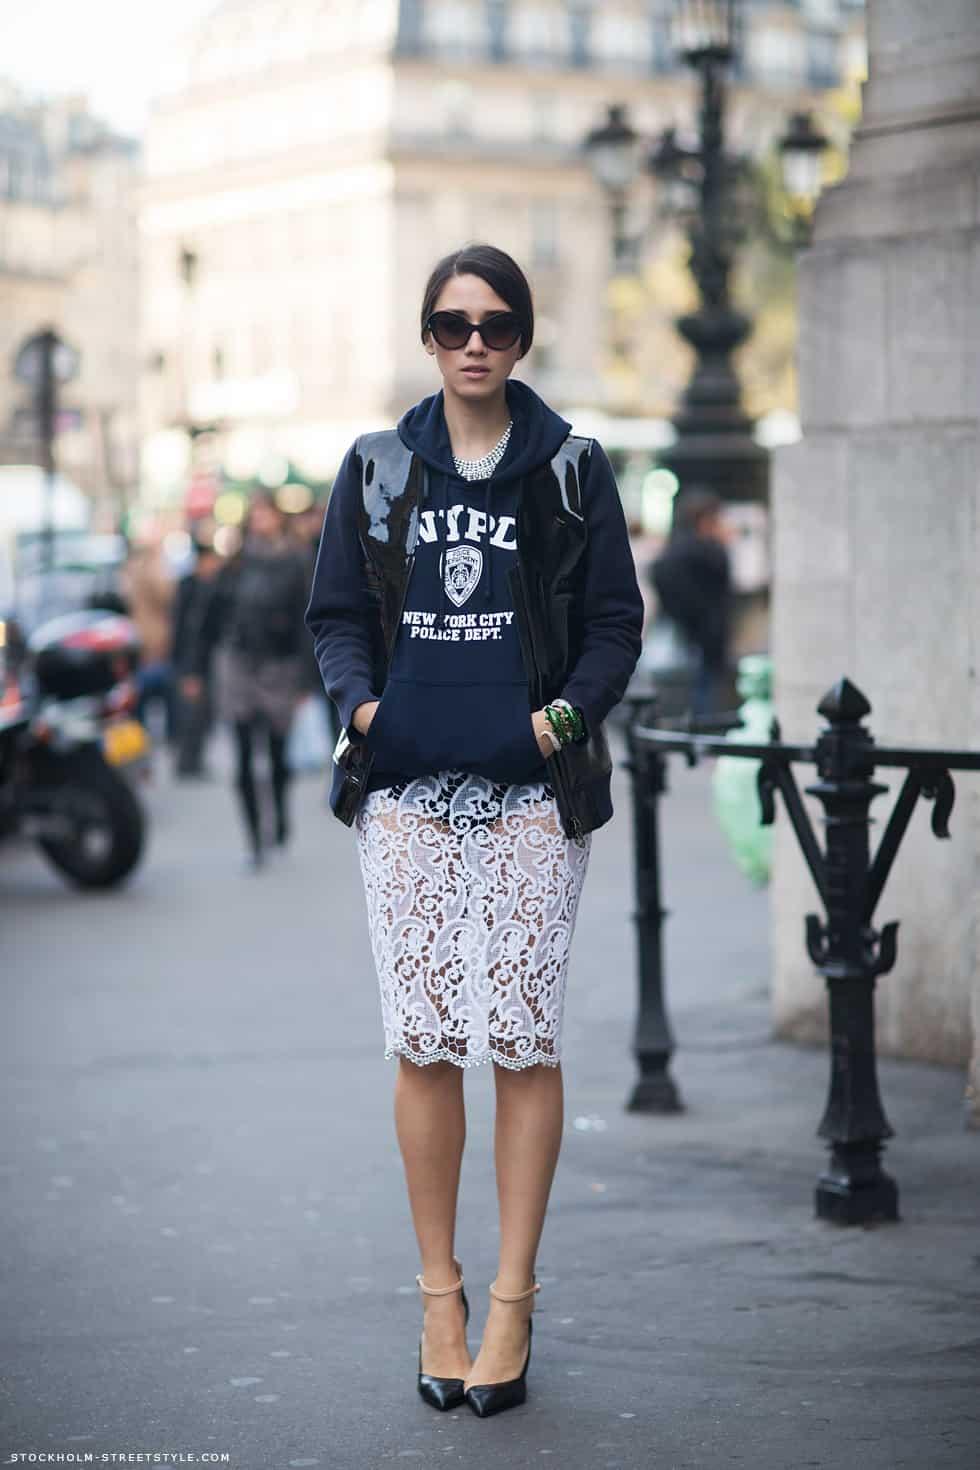 sweatshirt-lace-skirt